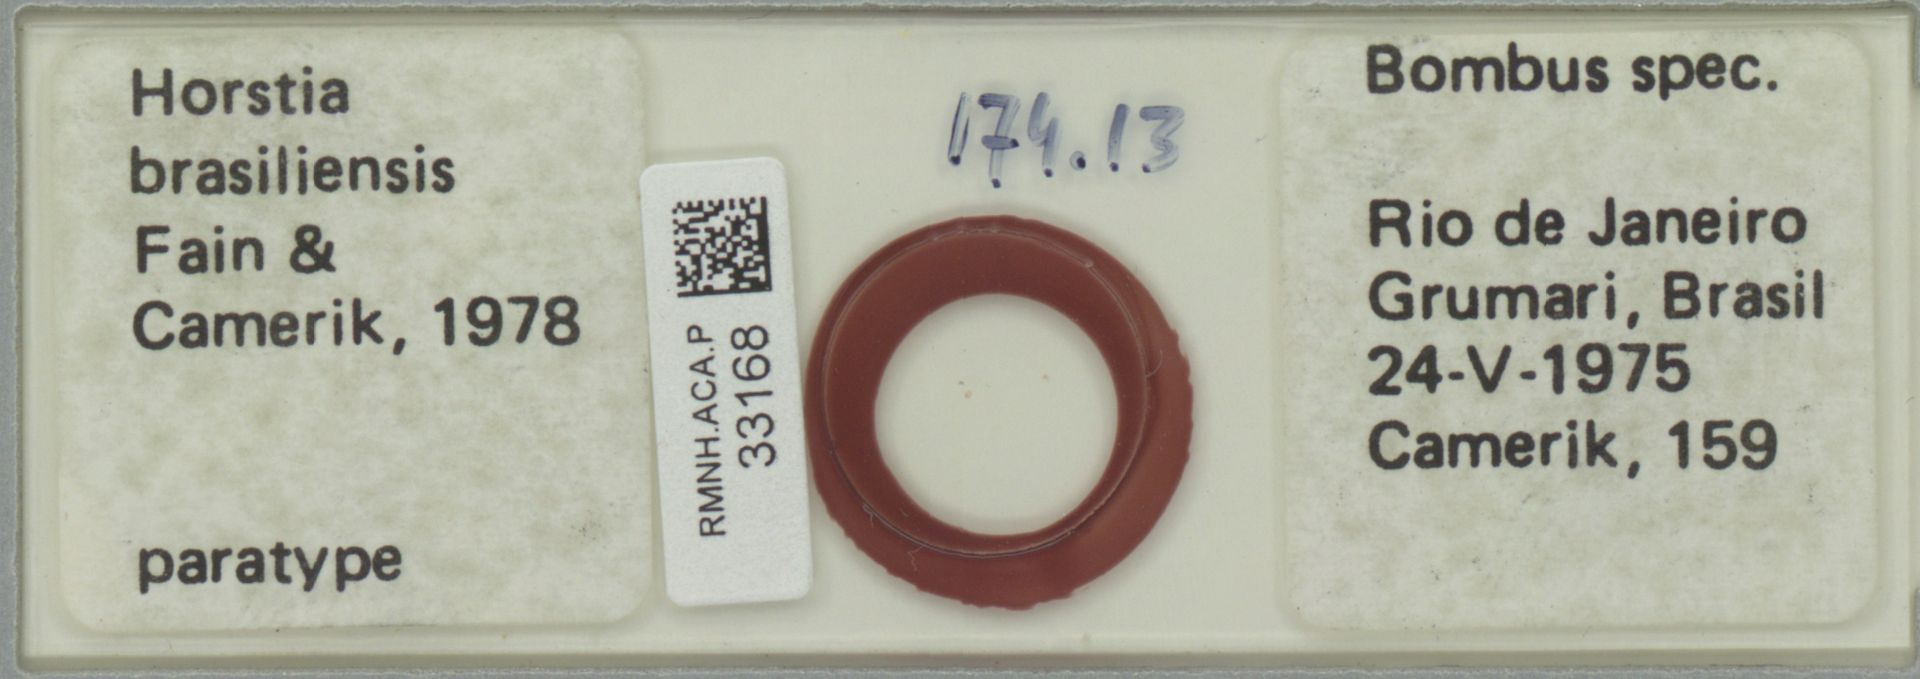 RMNH.ACA.P.33168 | Horstia brasiliensis Fain & Camerik, 1978